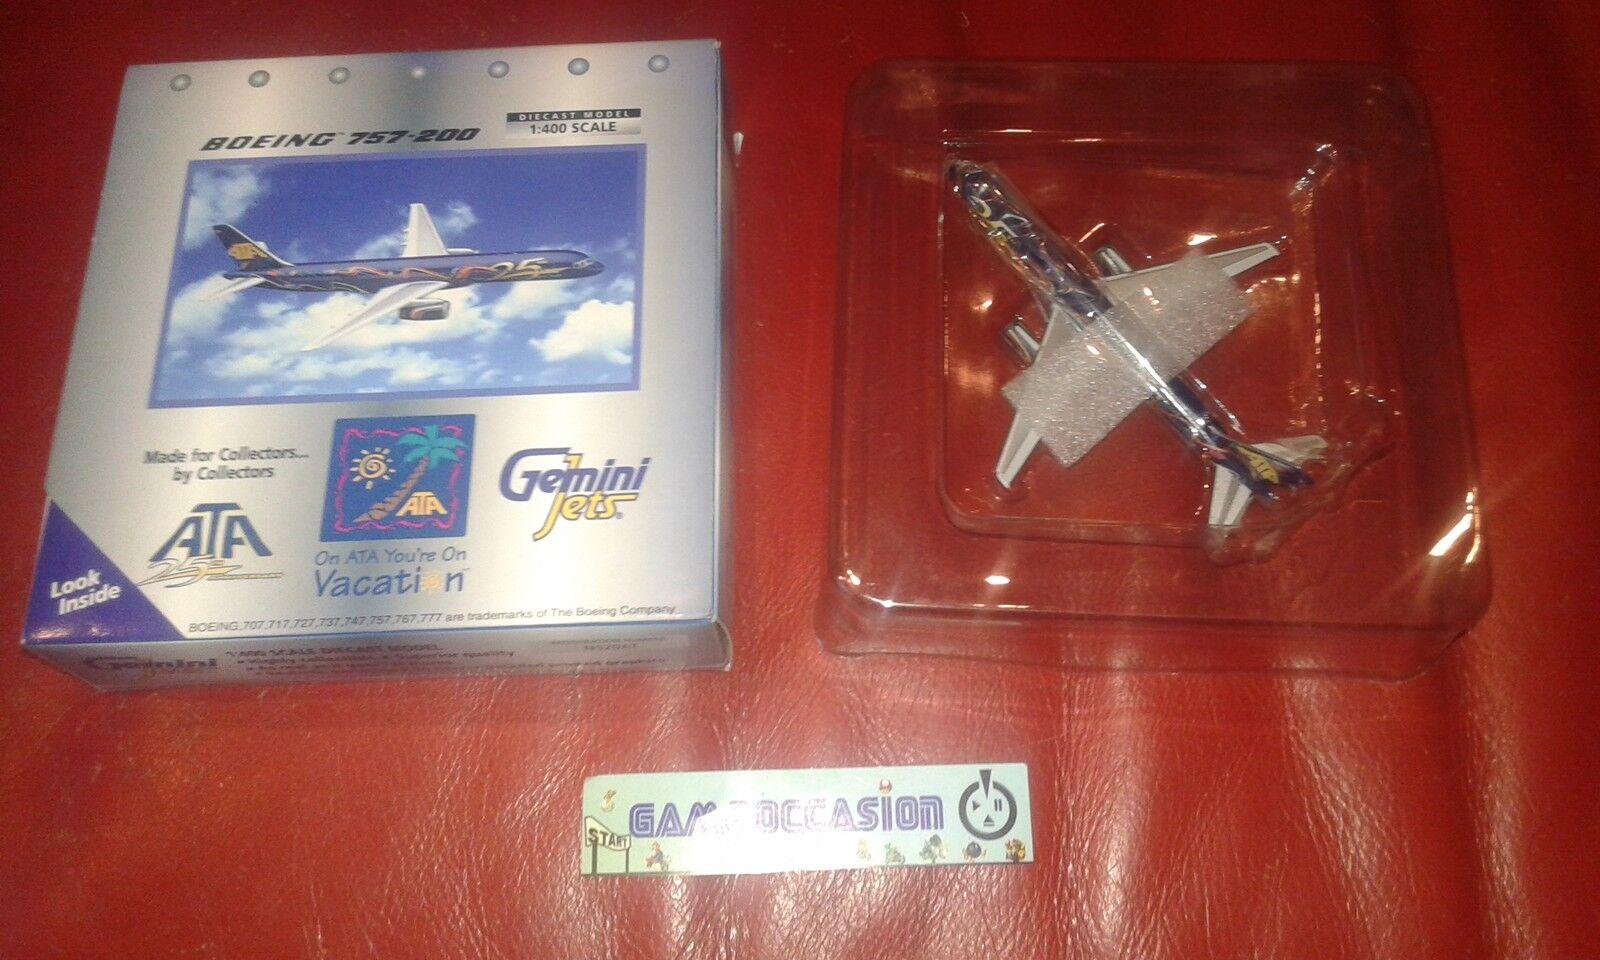 Flugzeug Boeing 747-200 Gemini Jets Ata 25th Anniversary 1 400 Metall